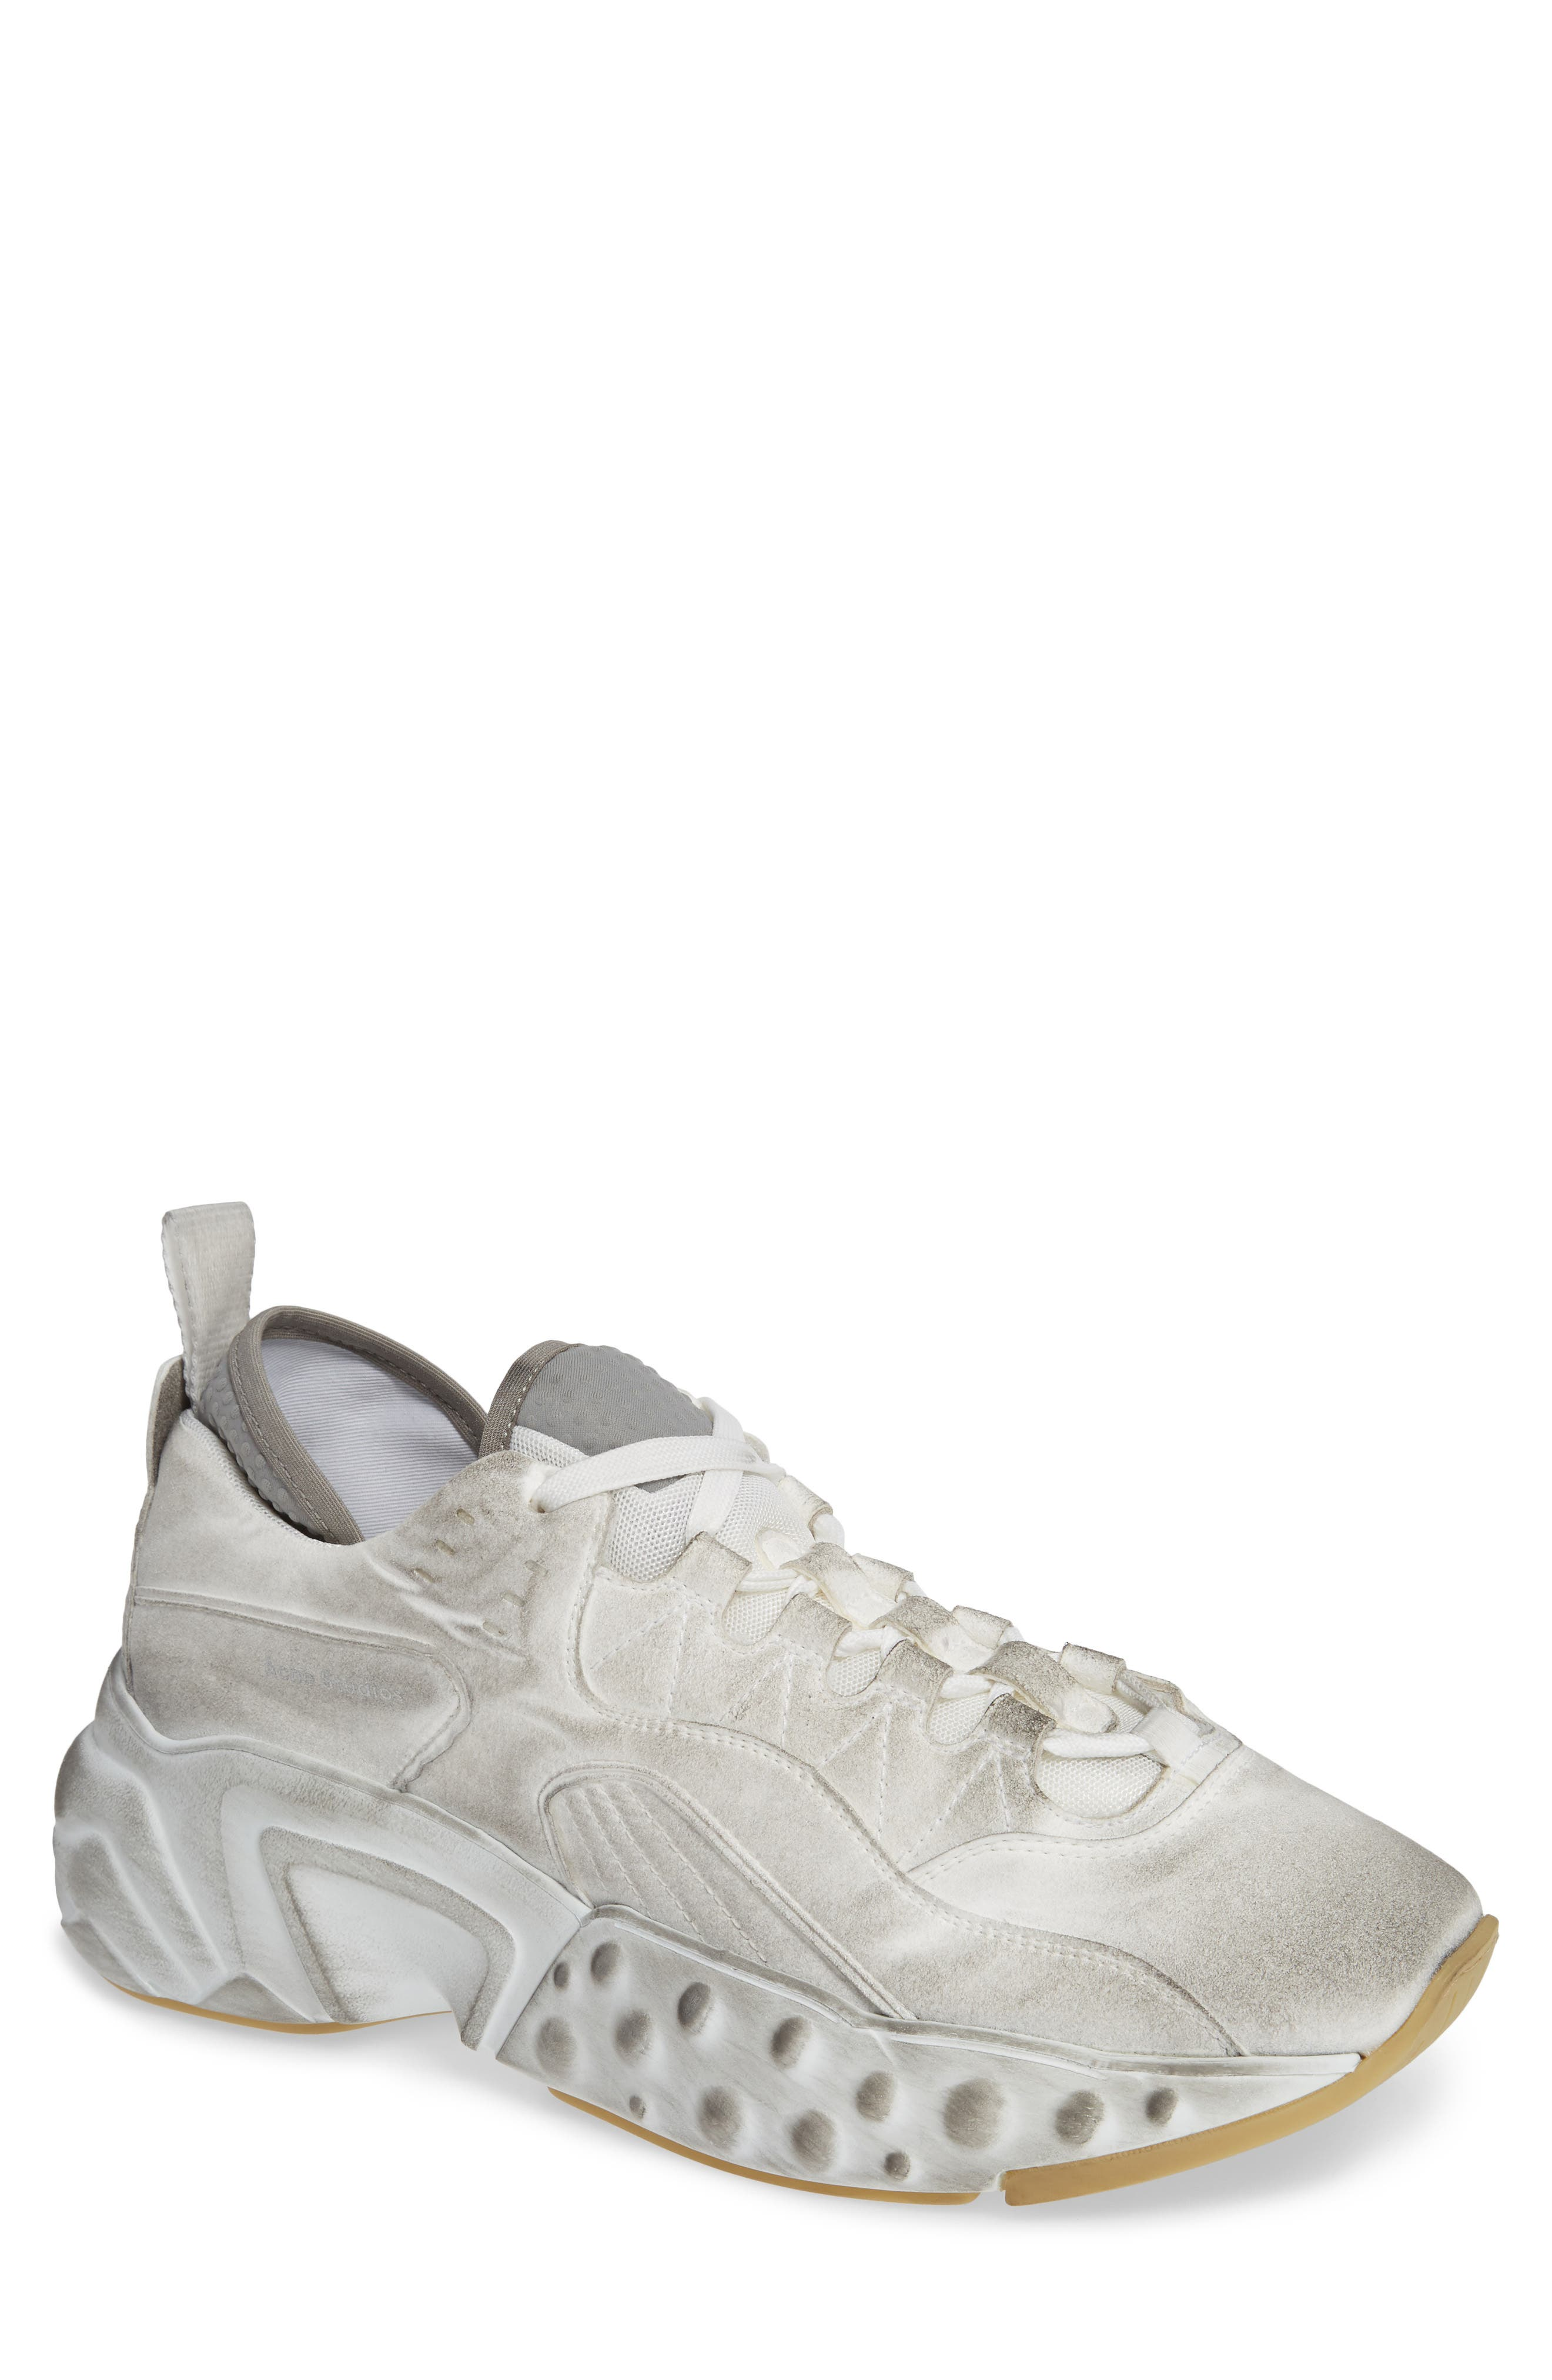 Rockaway Built-Up Sneaker,                             Main thumbnail 1, color,                             WHITE